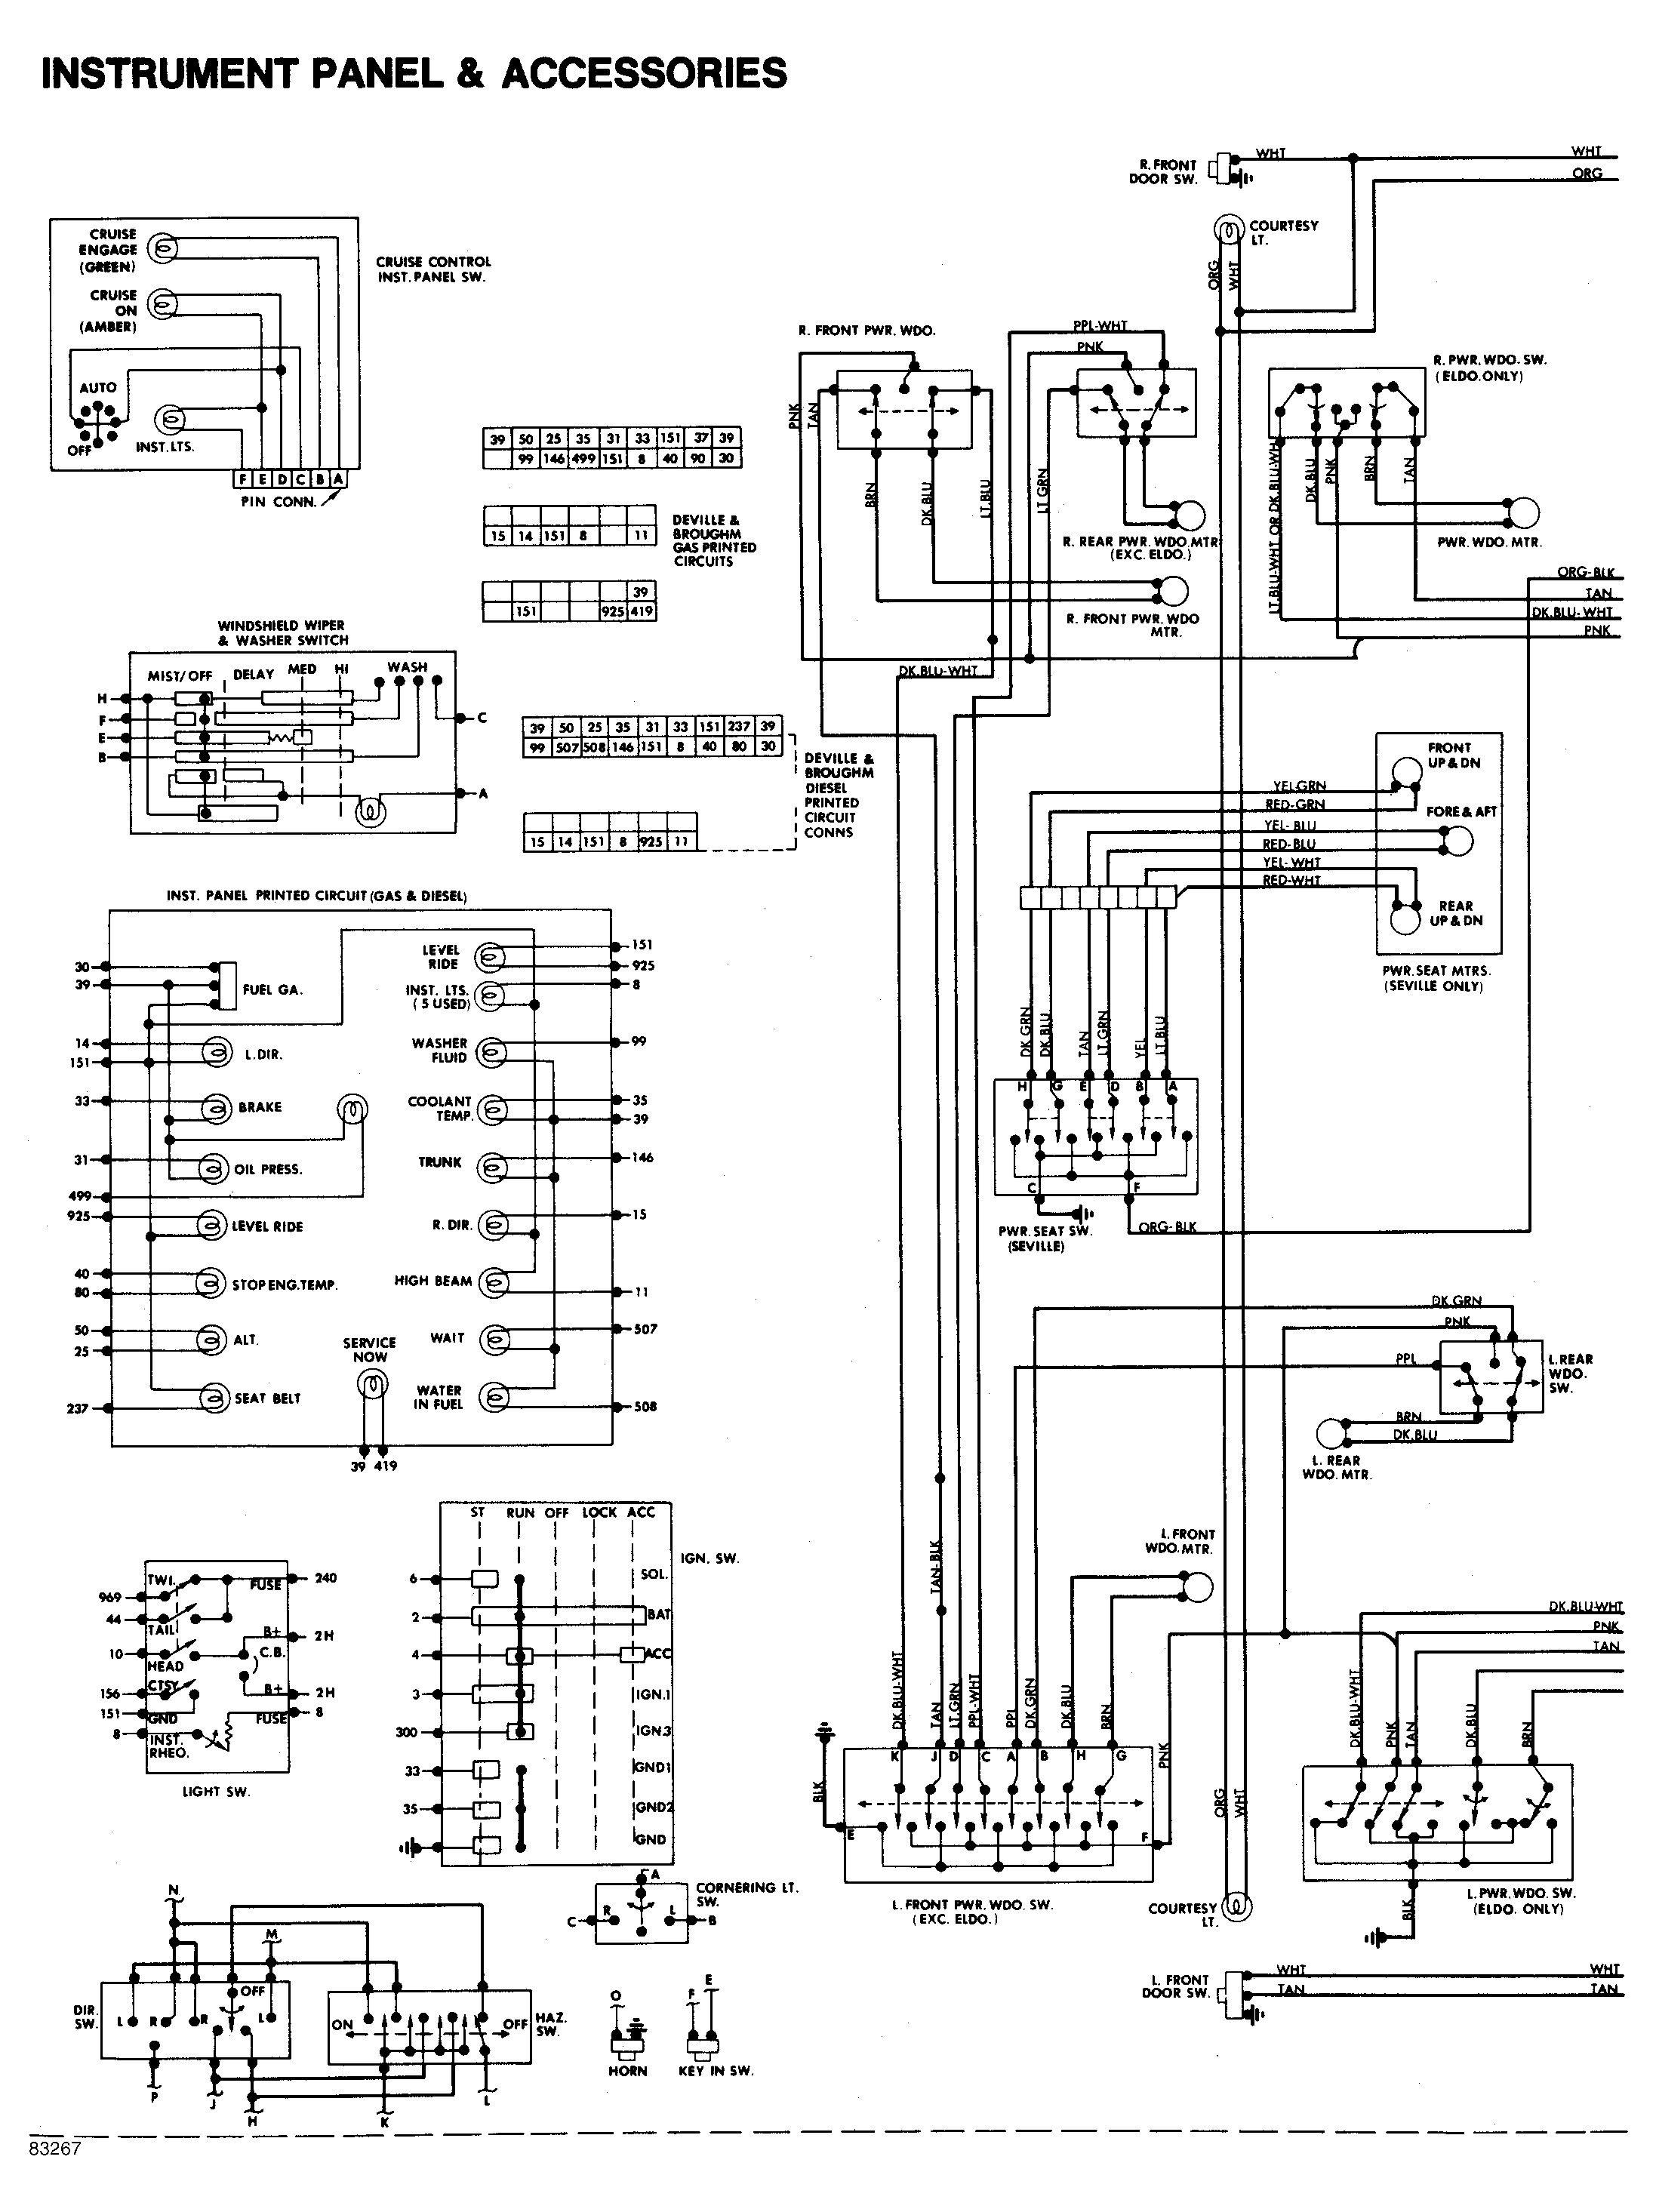 Superb Daewoo Wiring Harness Diagram Printable Wiring Diagram Schematic Wiring Cloud Picalendutblikvittorg